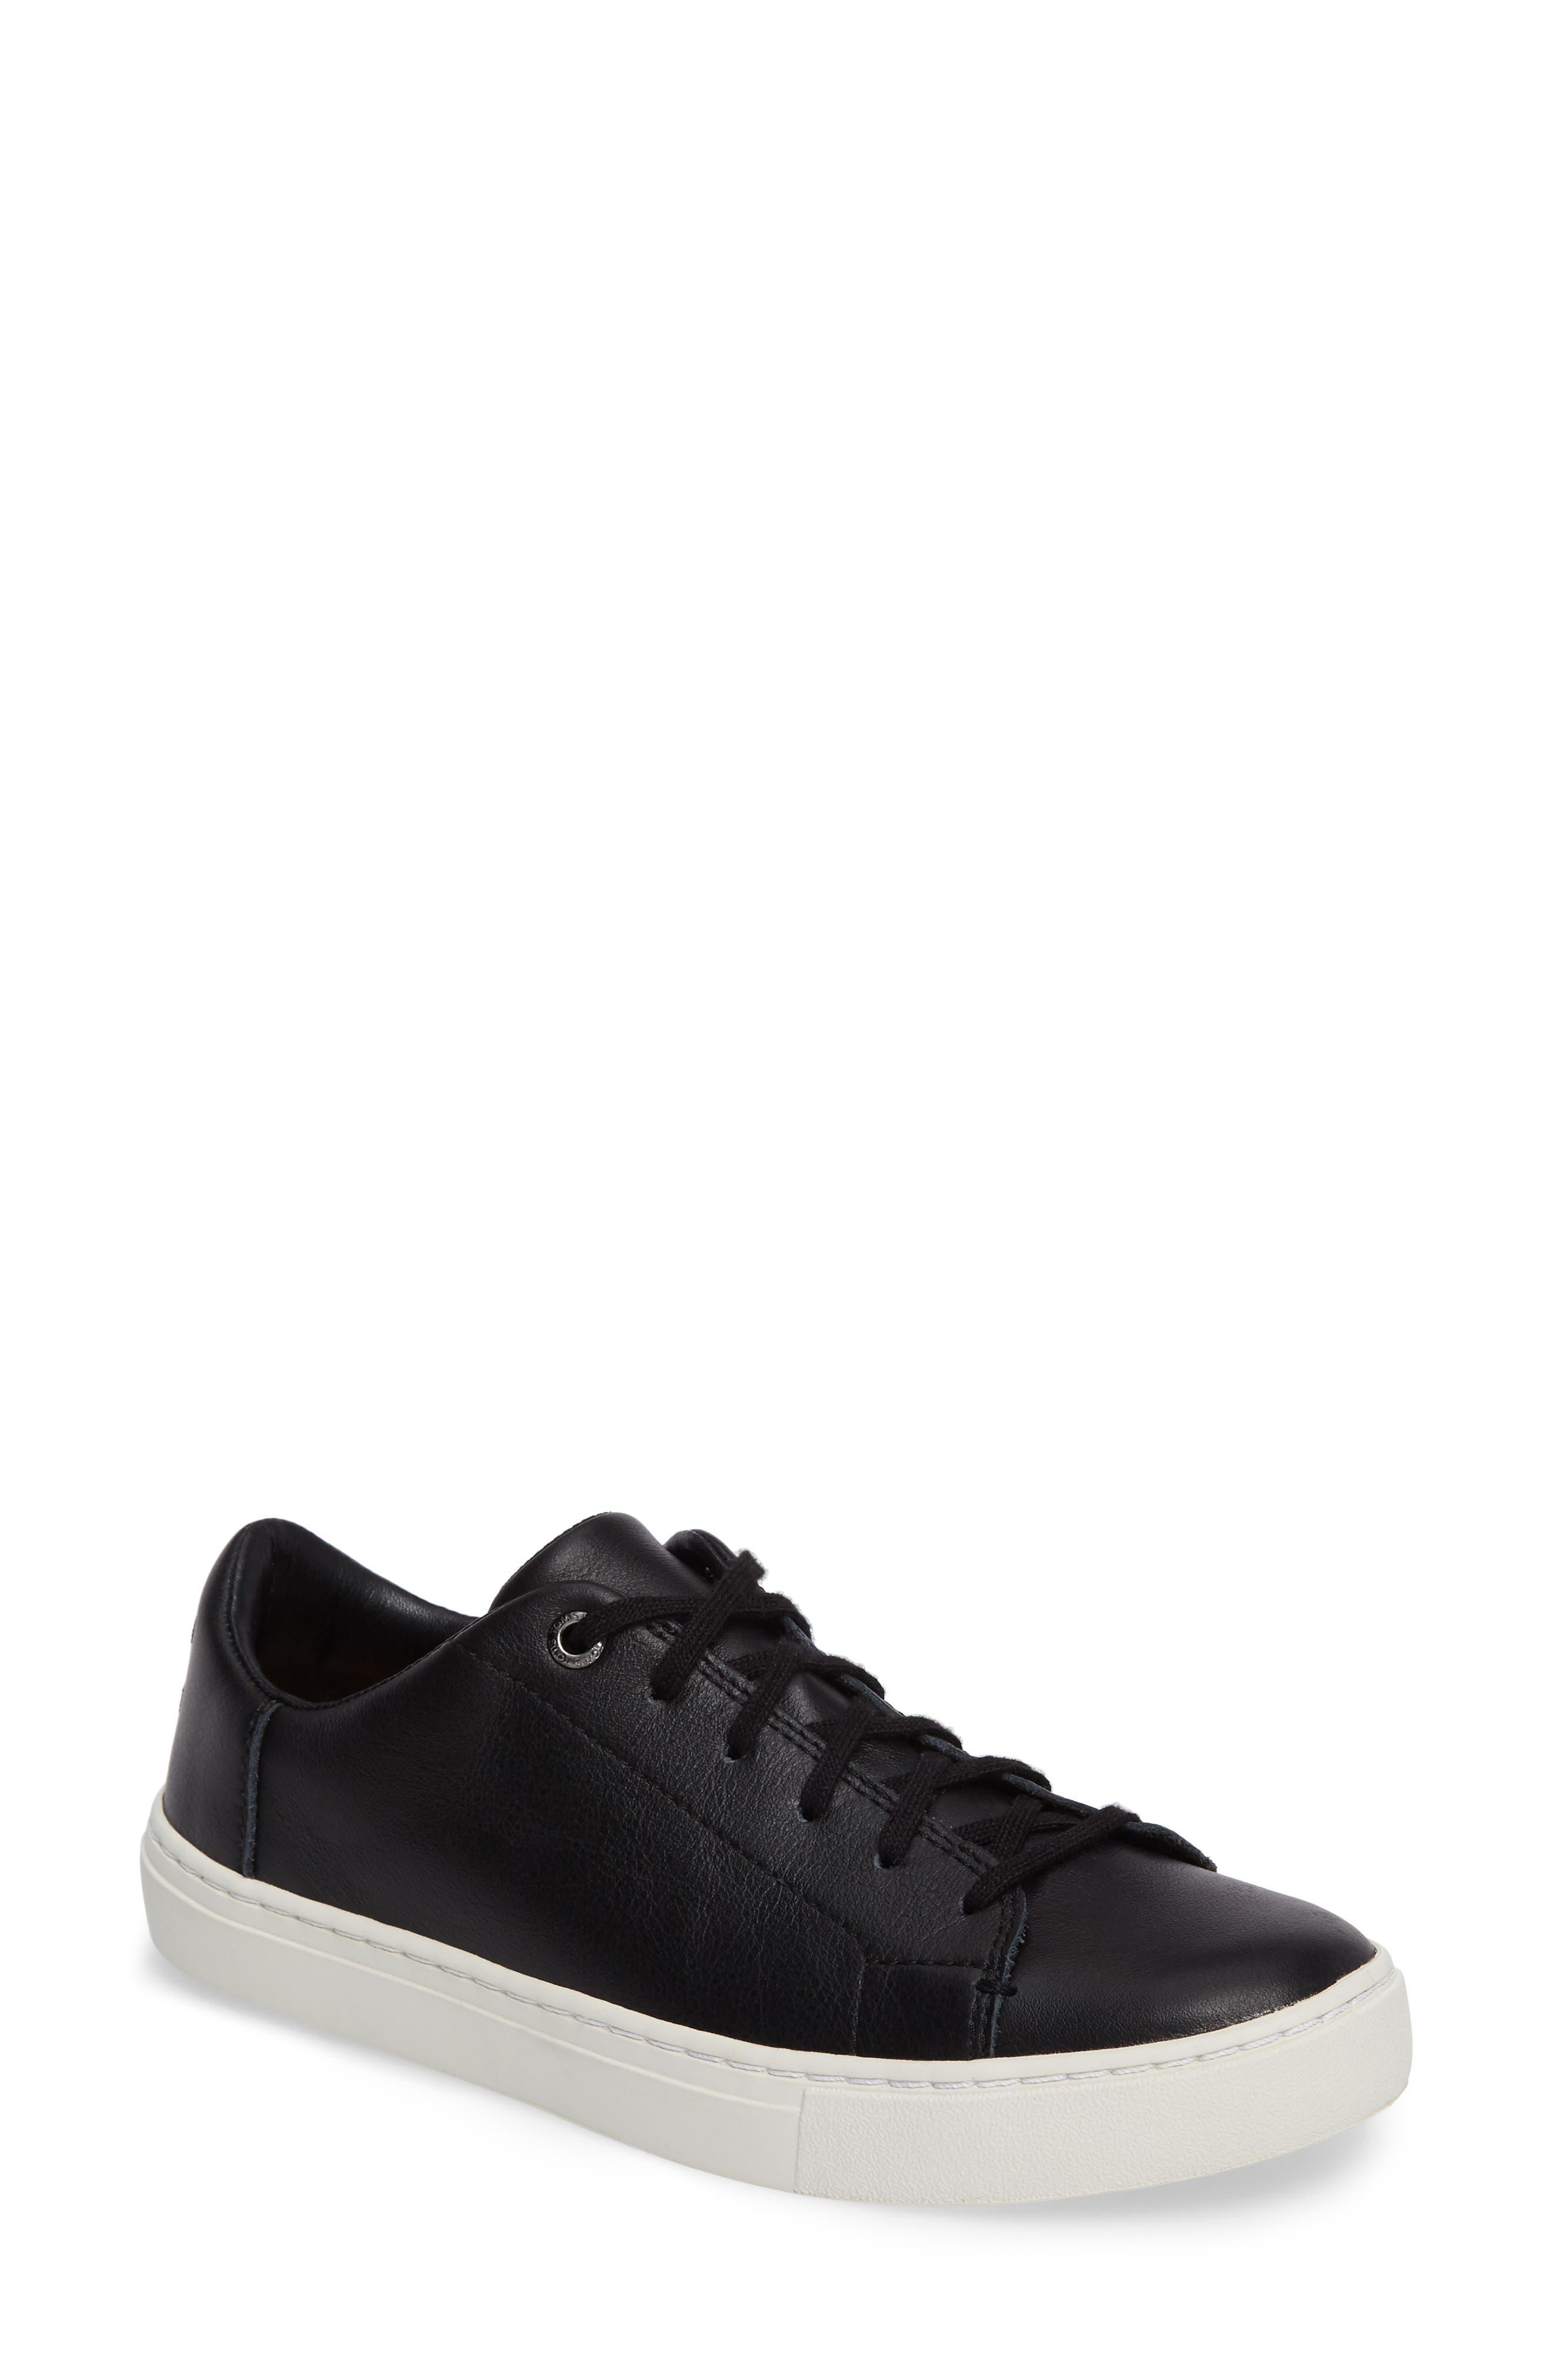 Lenox Sneaker,                             Main thumbnail 1, color,                             001